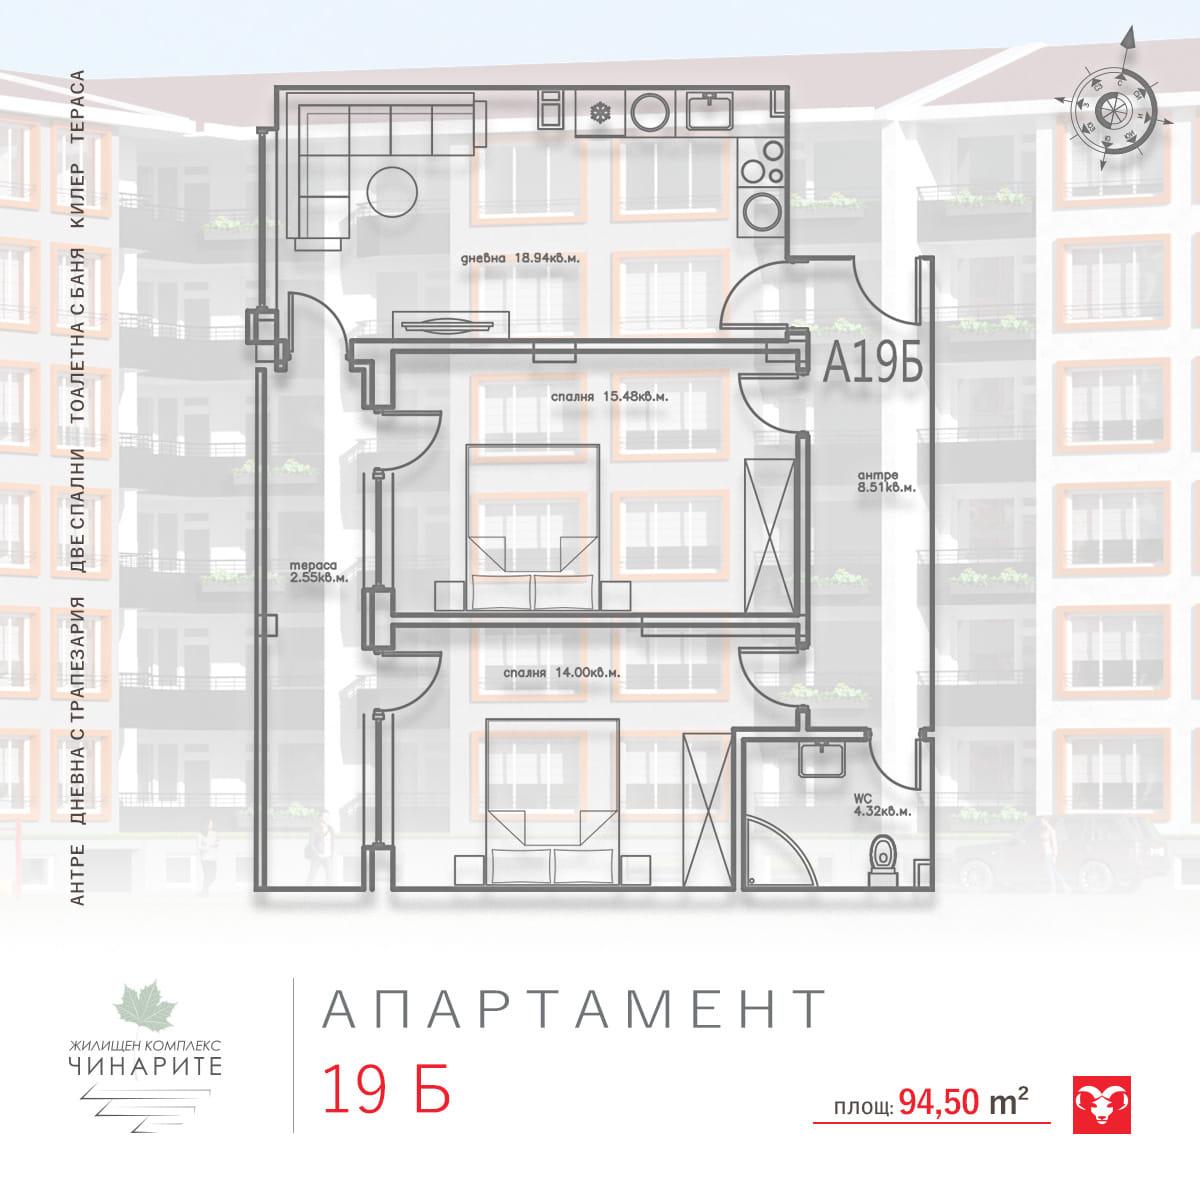 Апартамент Б1914